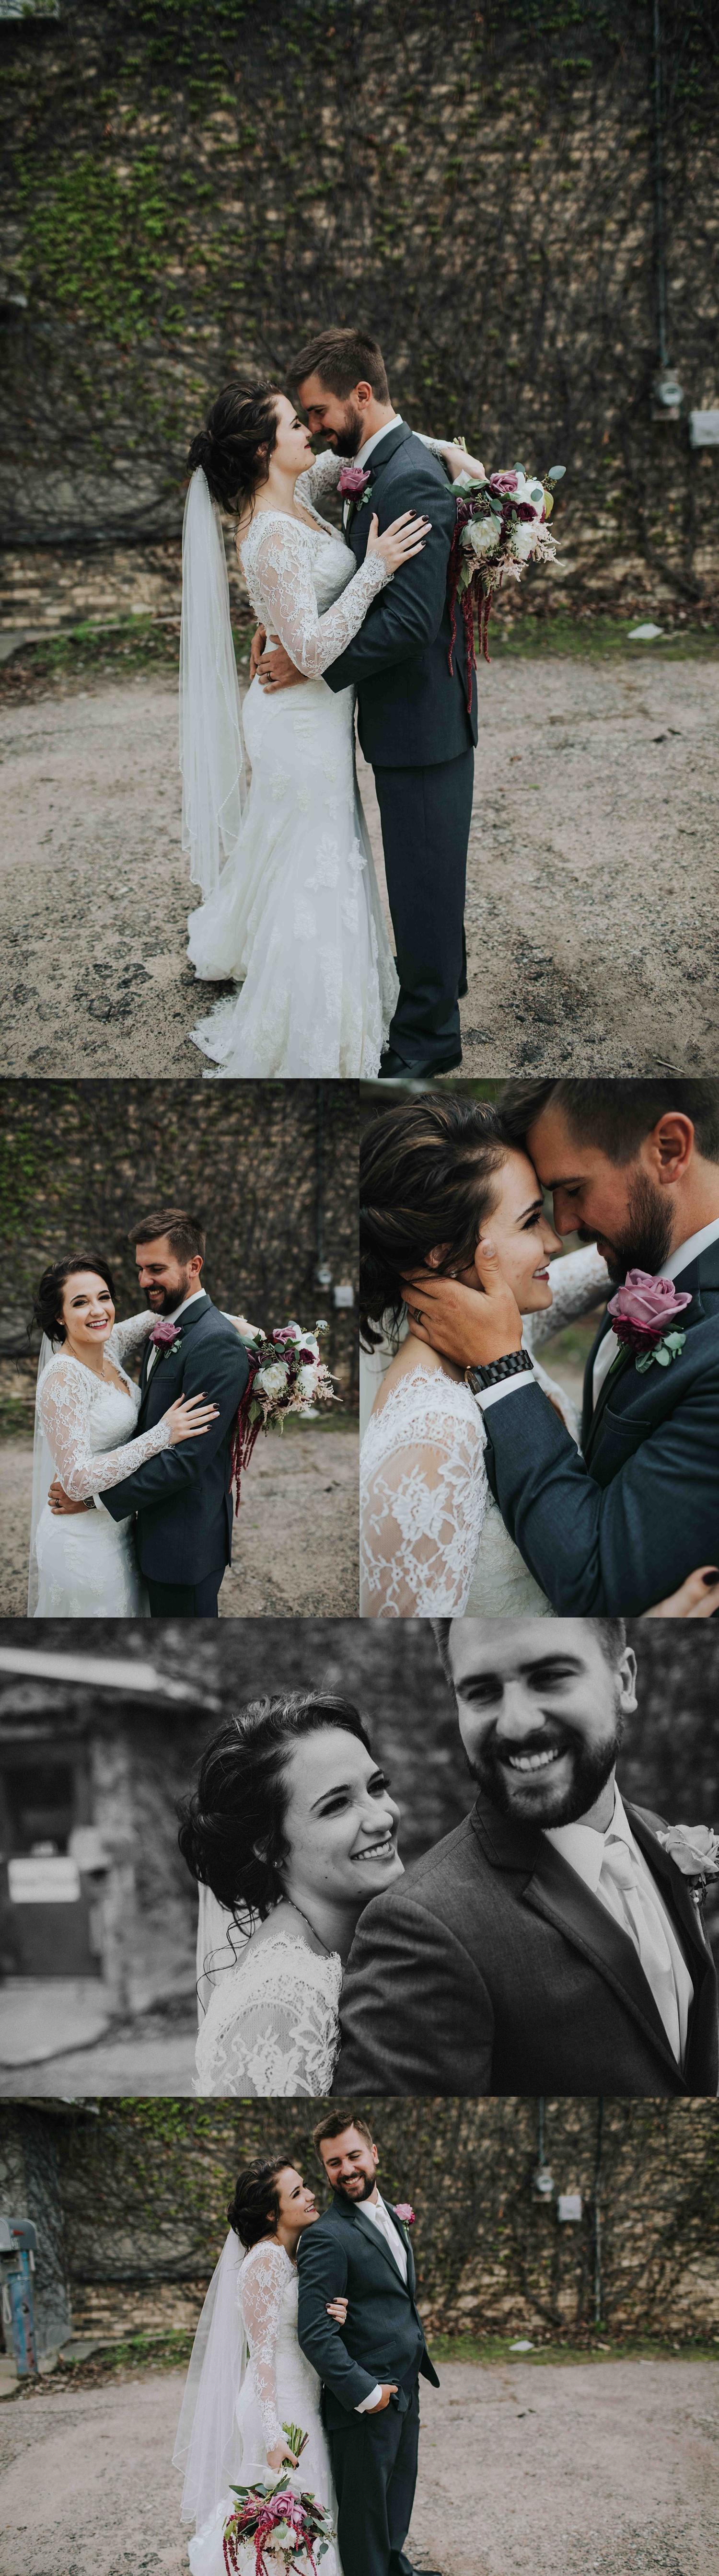 Ridges Golf Course Central Wisconsin Wedding Photographer Chloe Ann Photography_0011.jpg